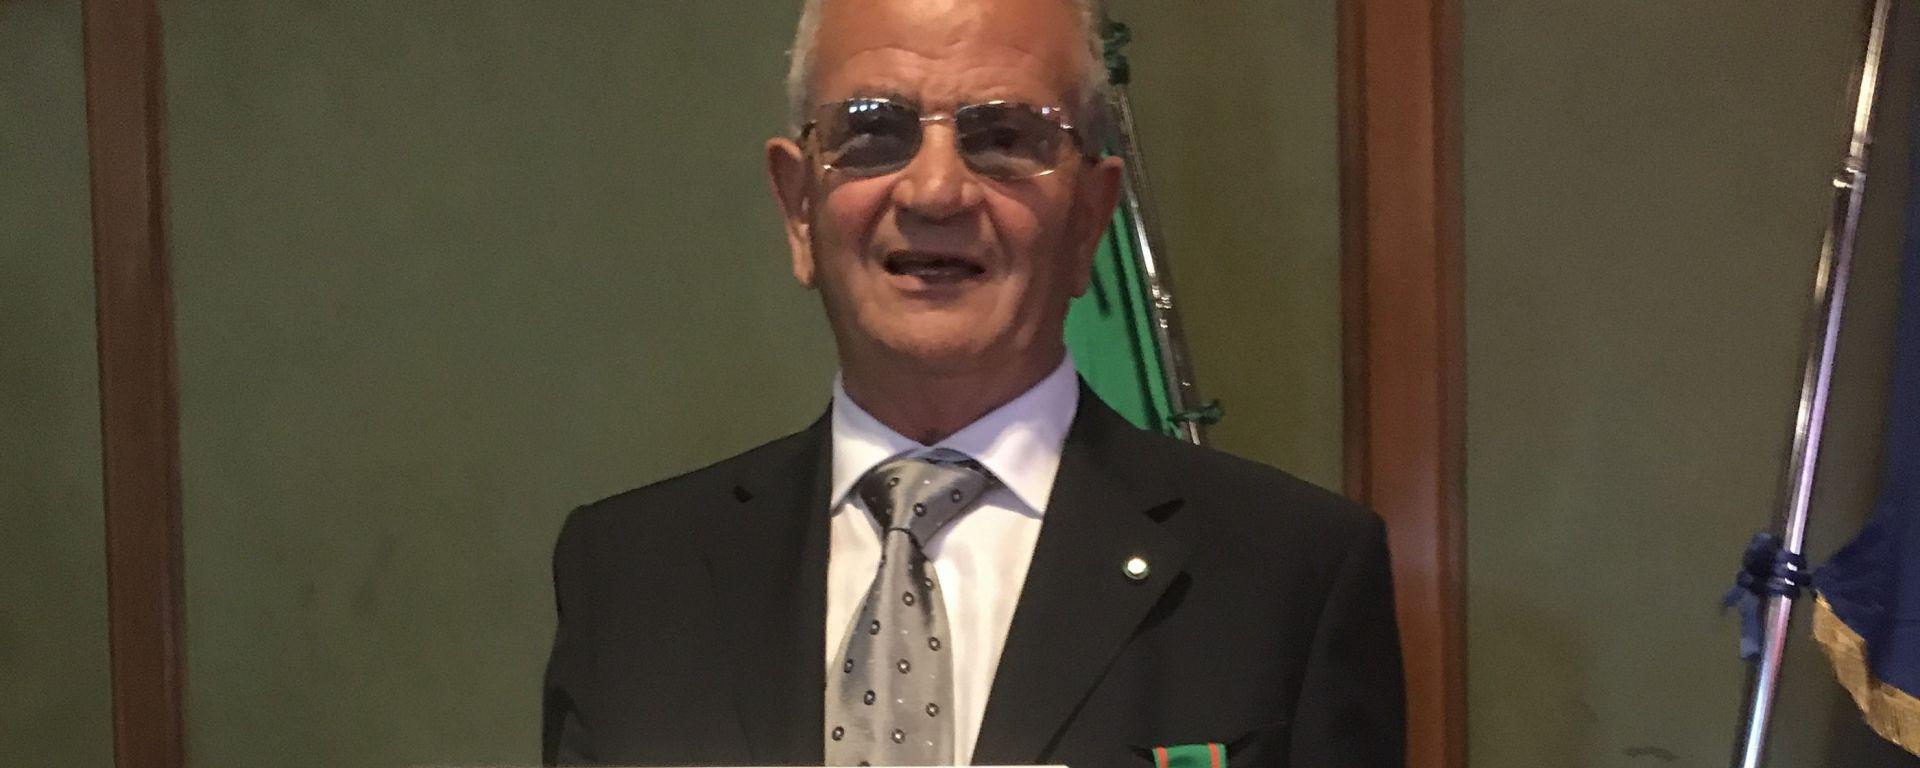 Ernesto Gazzola fondatore di Gaerne